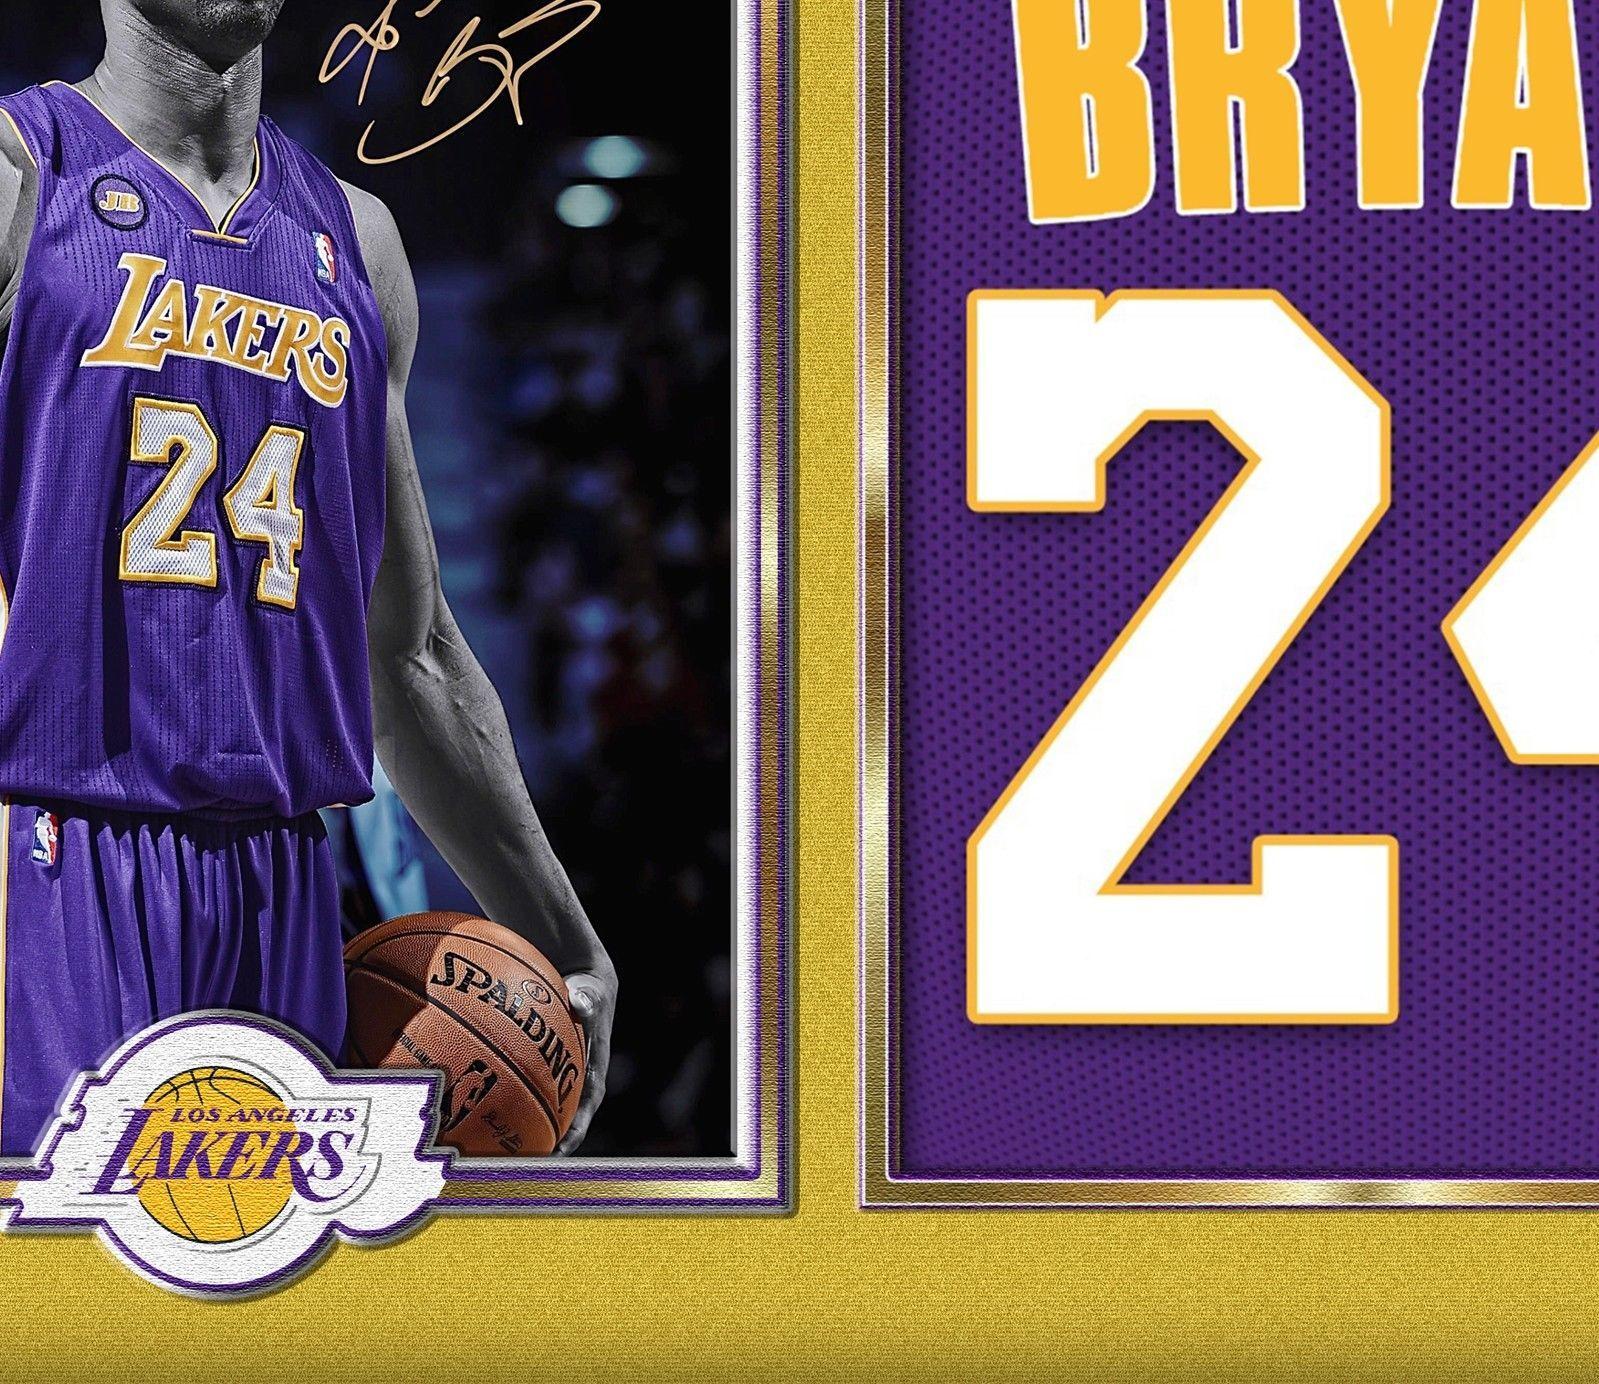 Kobe Bryant Lakers NBA signed autograph photo poster print KOBE BRYANT Framed